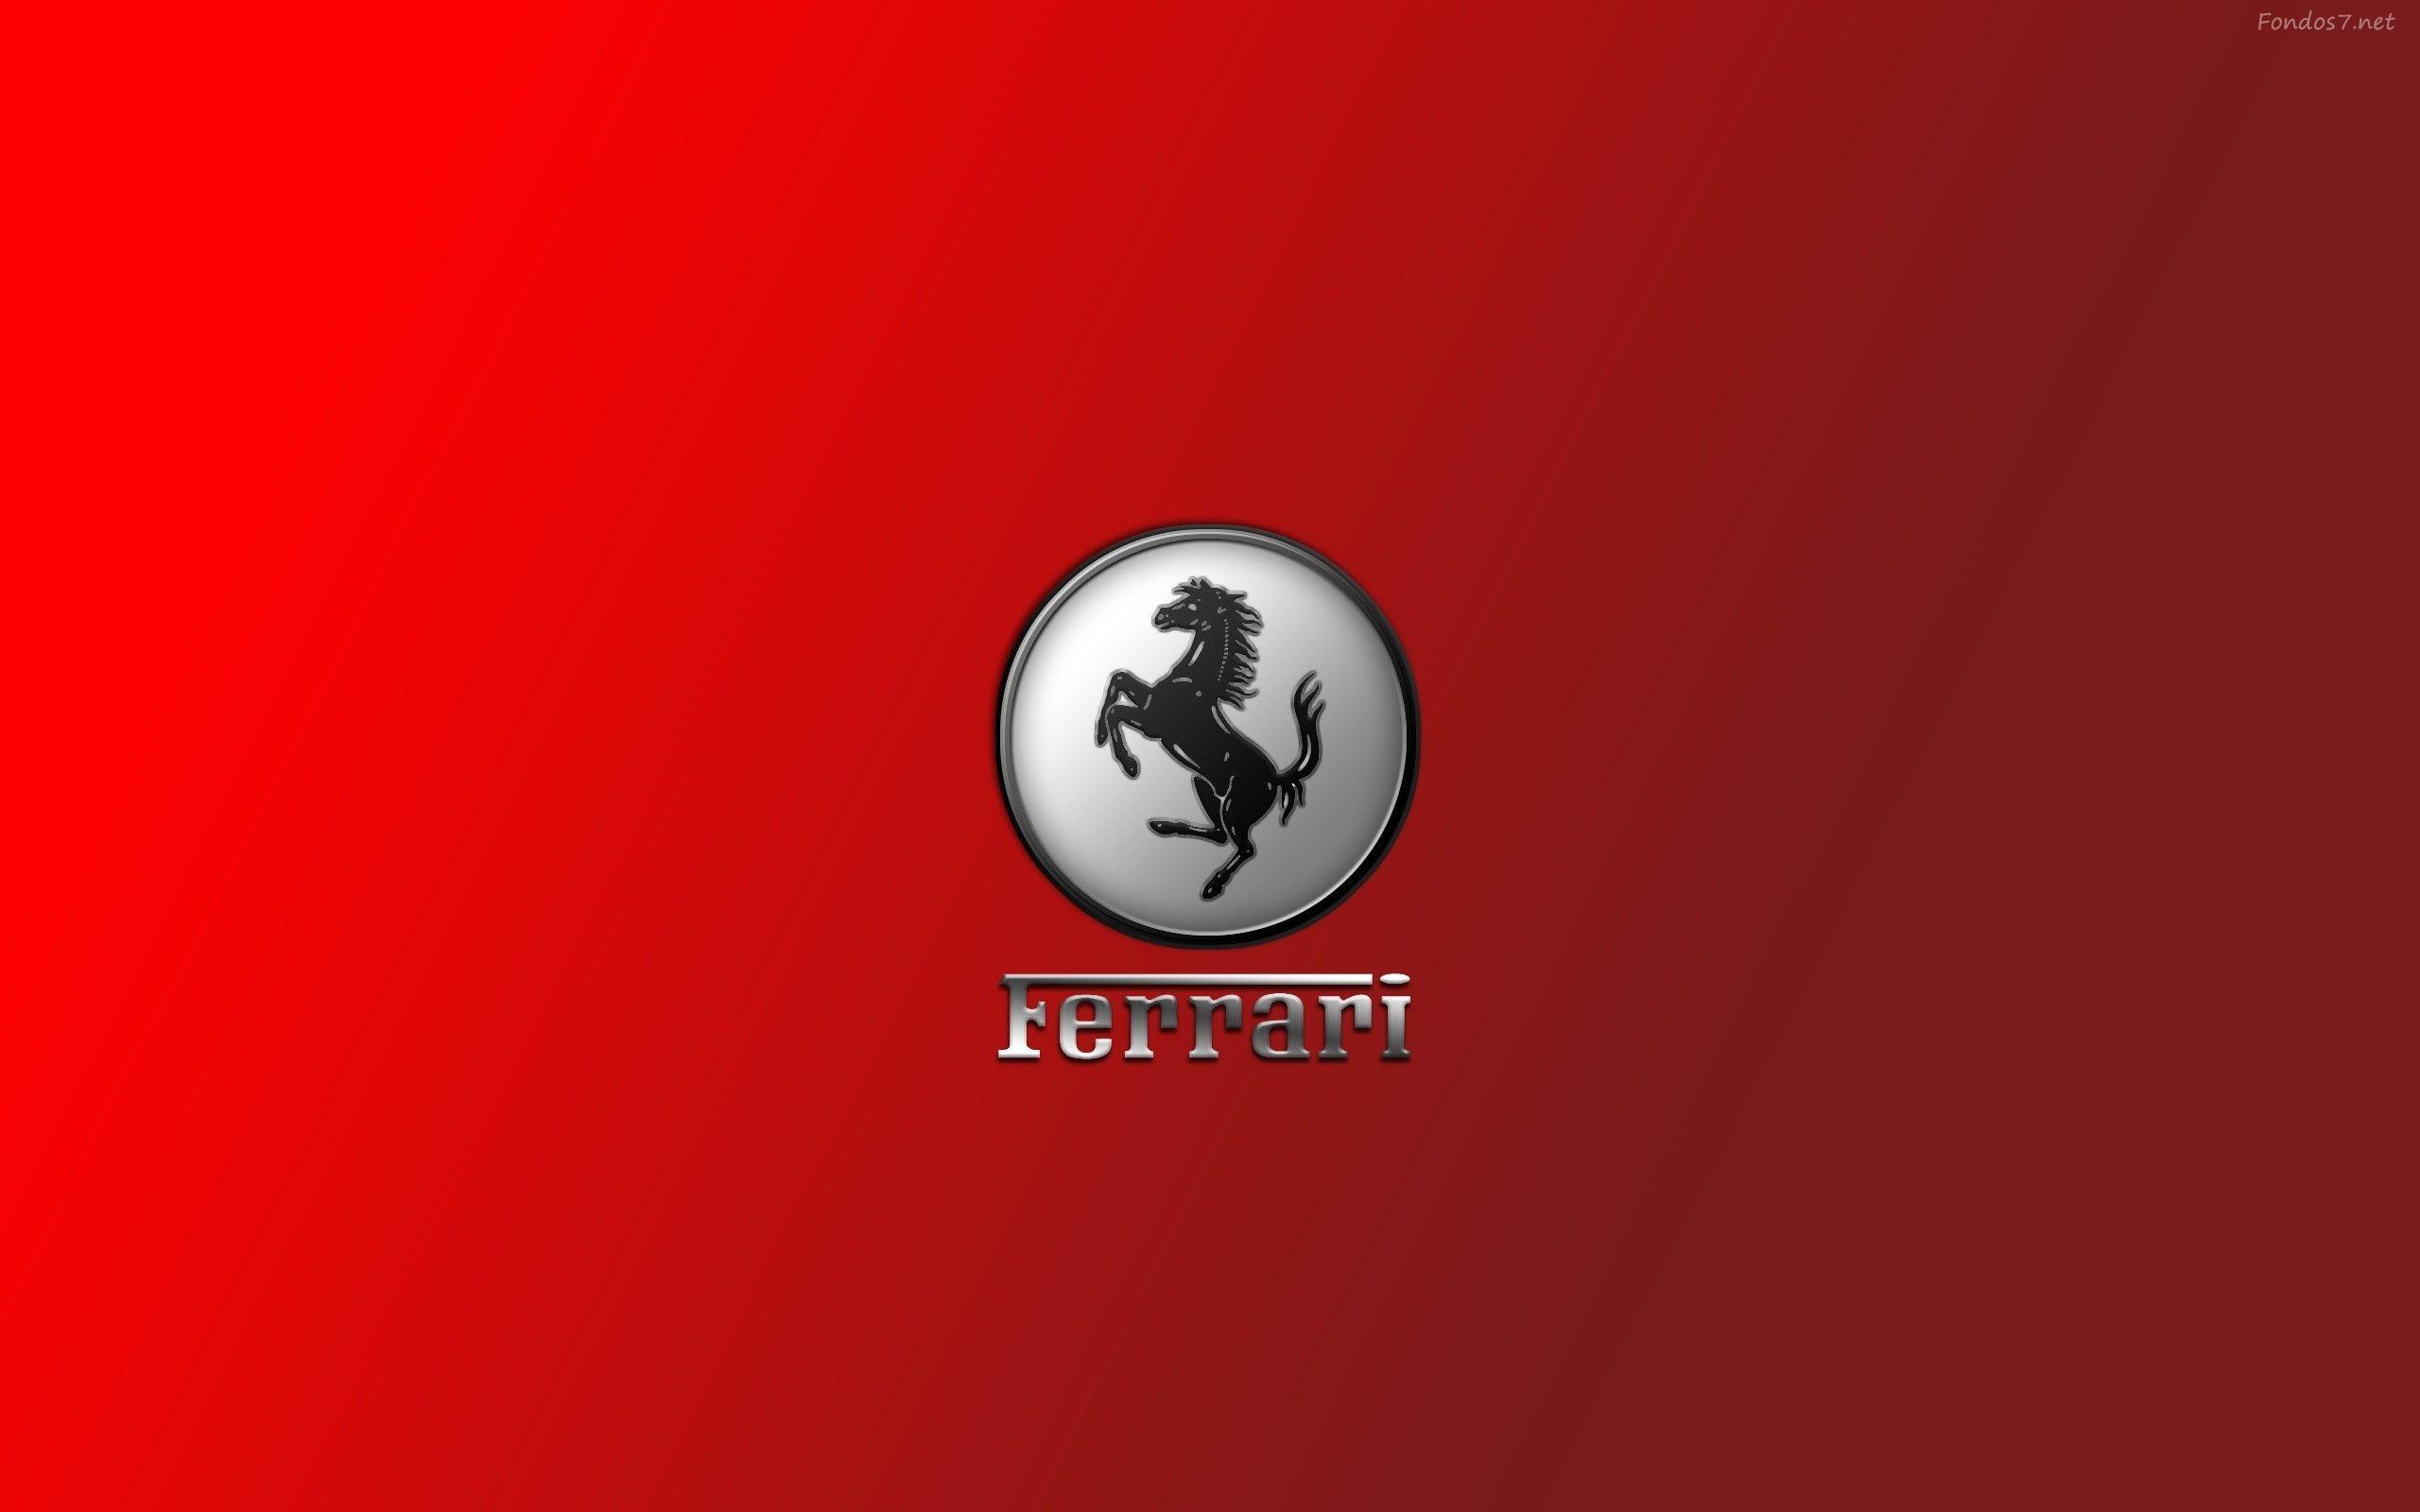 Ferrari Wallpapers Logo Hd   Vehicles Wallpapers   Pinterest   Ferrari and  Ferrari logo